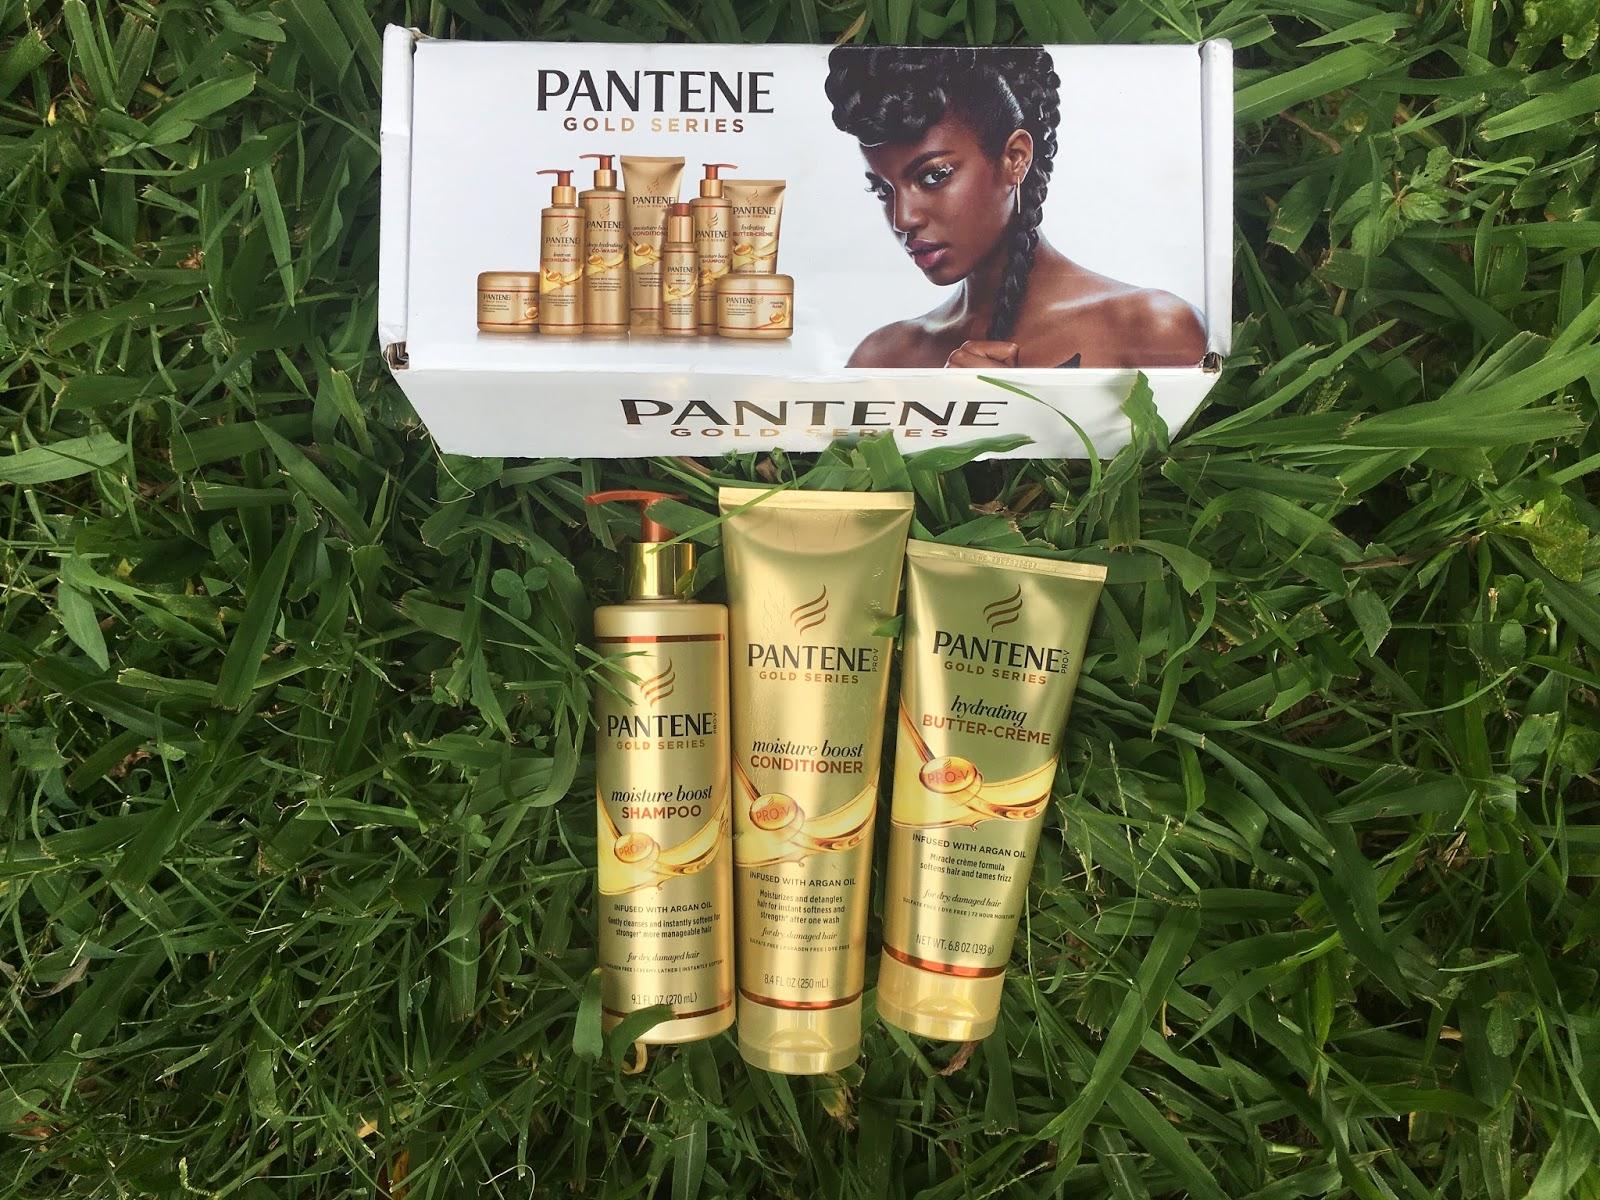 influenster Pantene Gold Series Voxbox